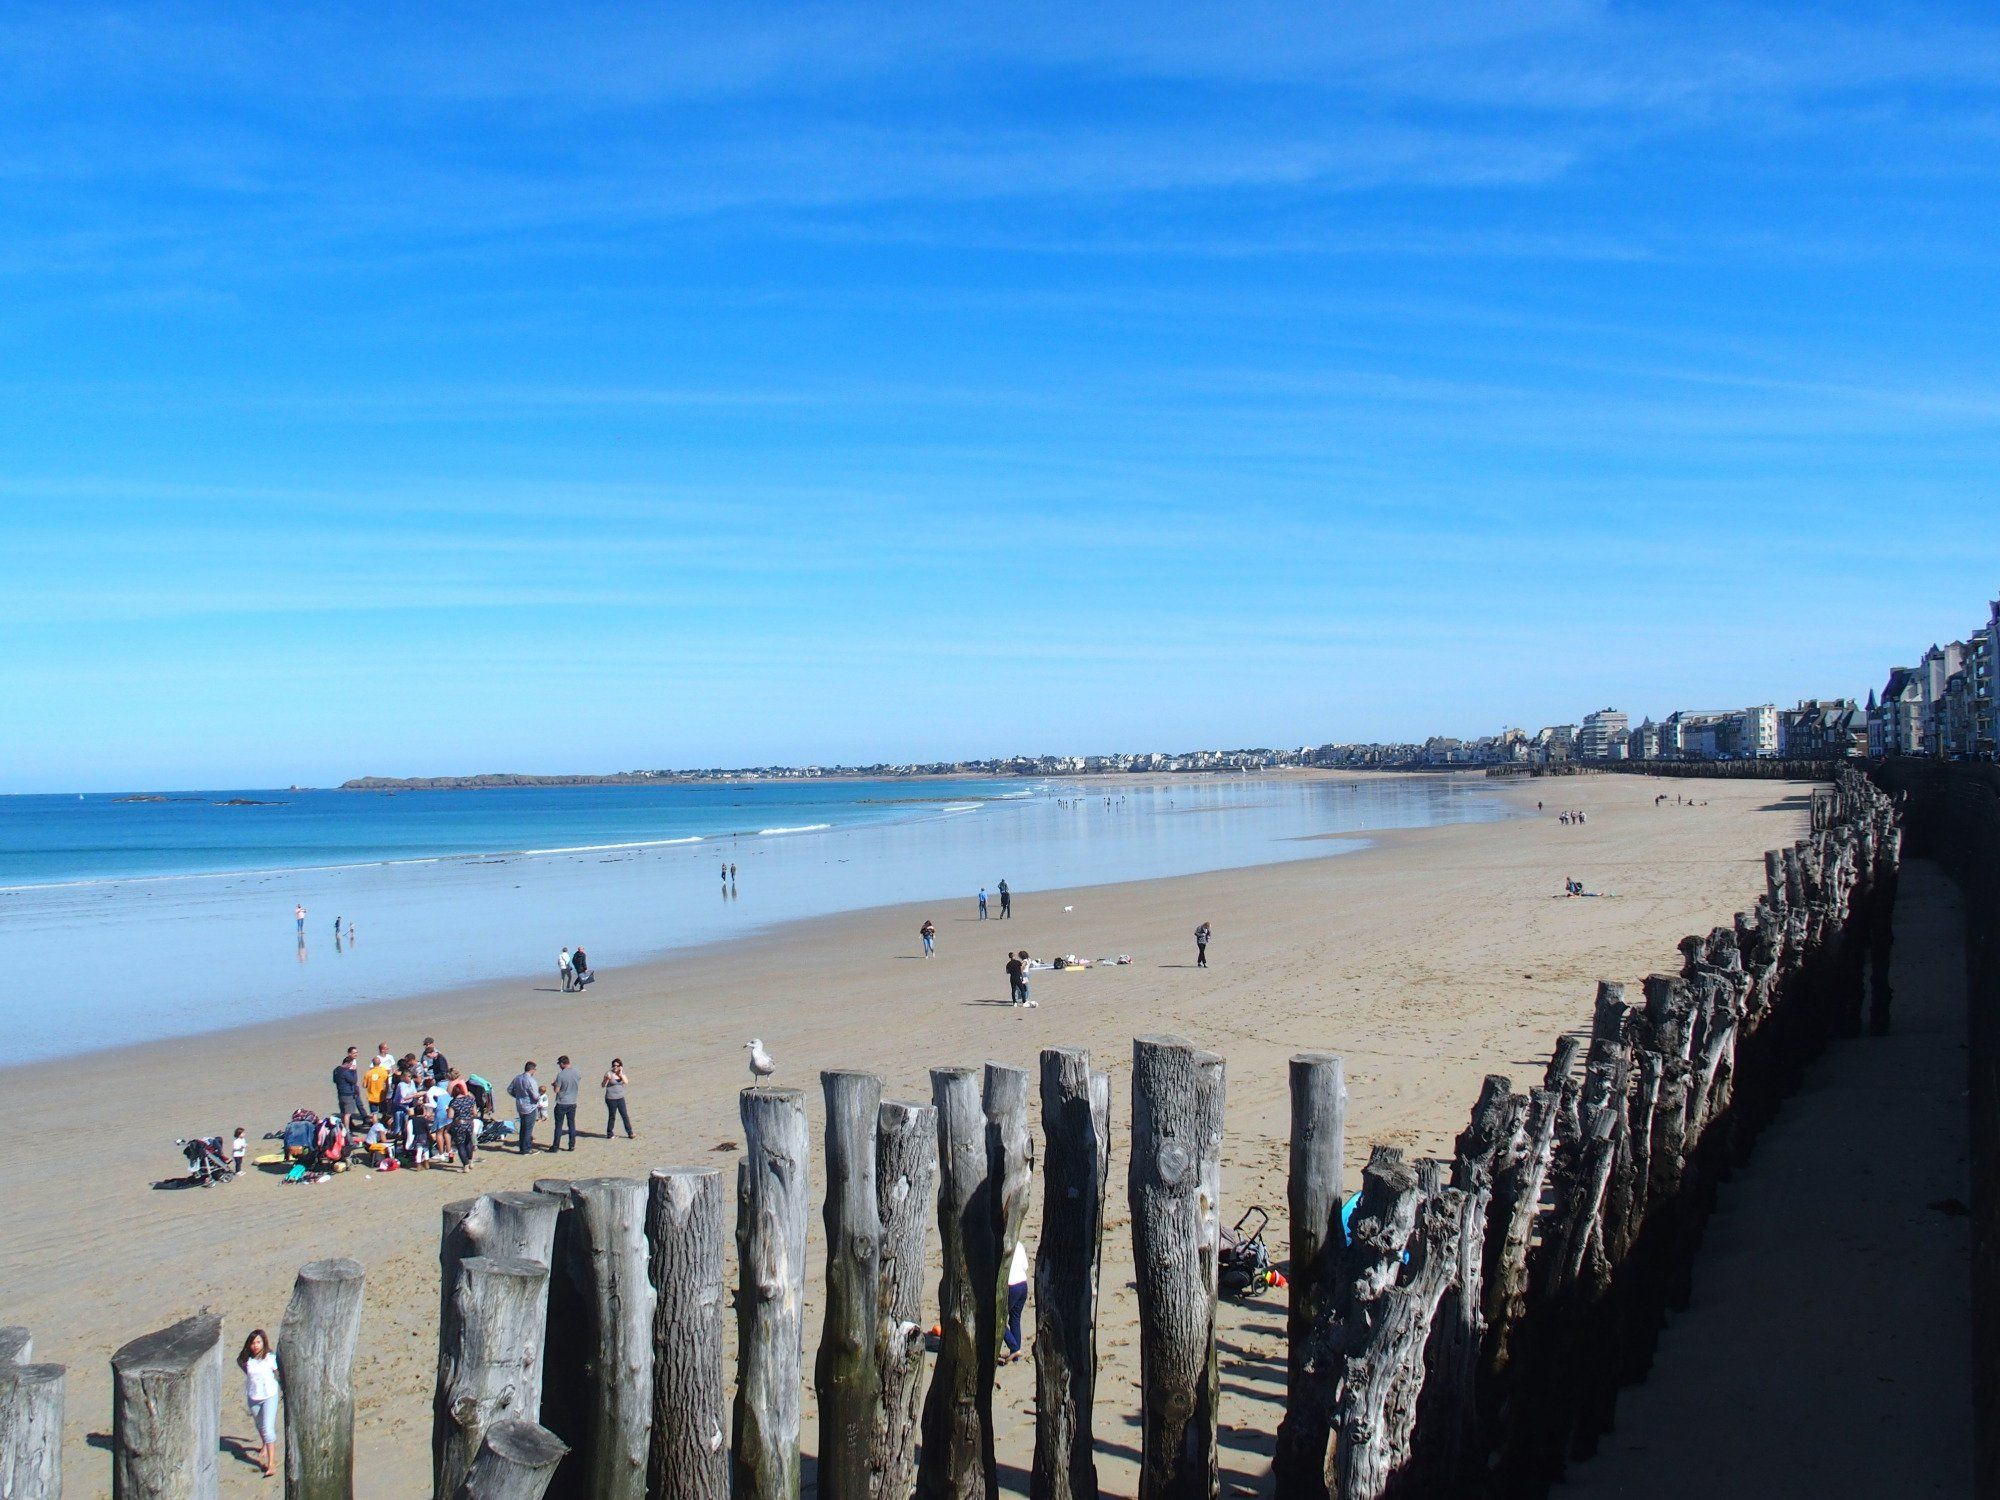 Plage du Silon Brittany France best beaches